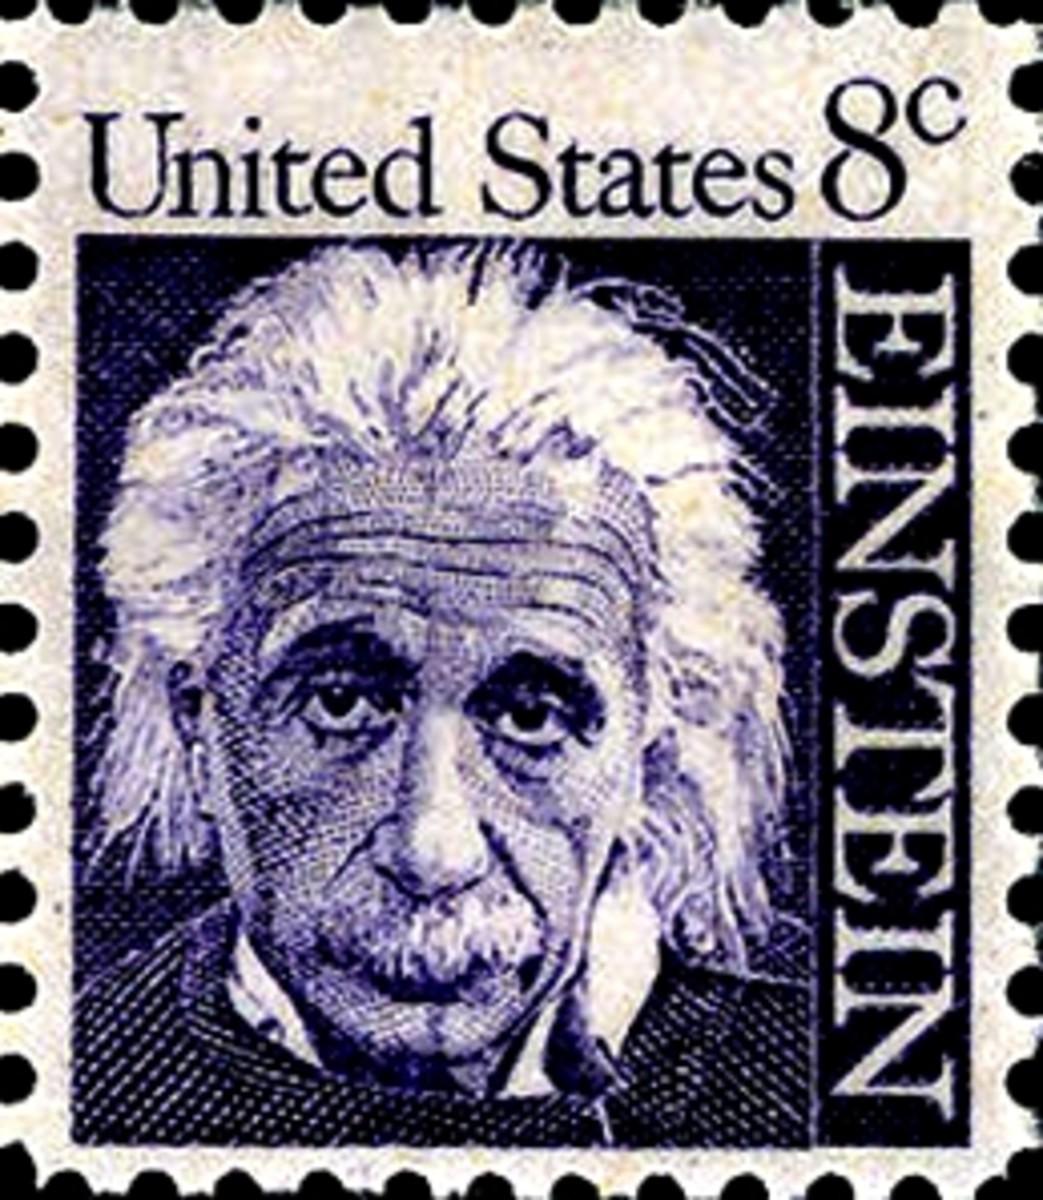 anothere Einstein stamp from USA